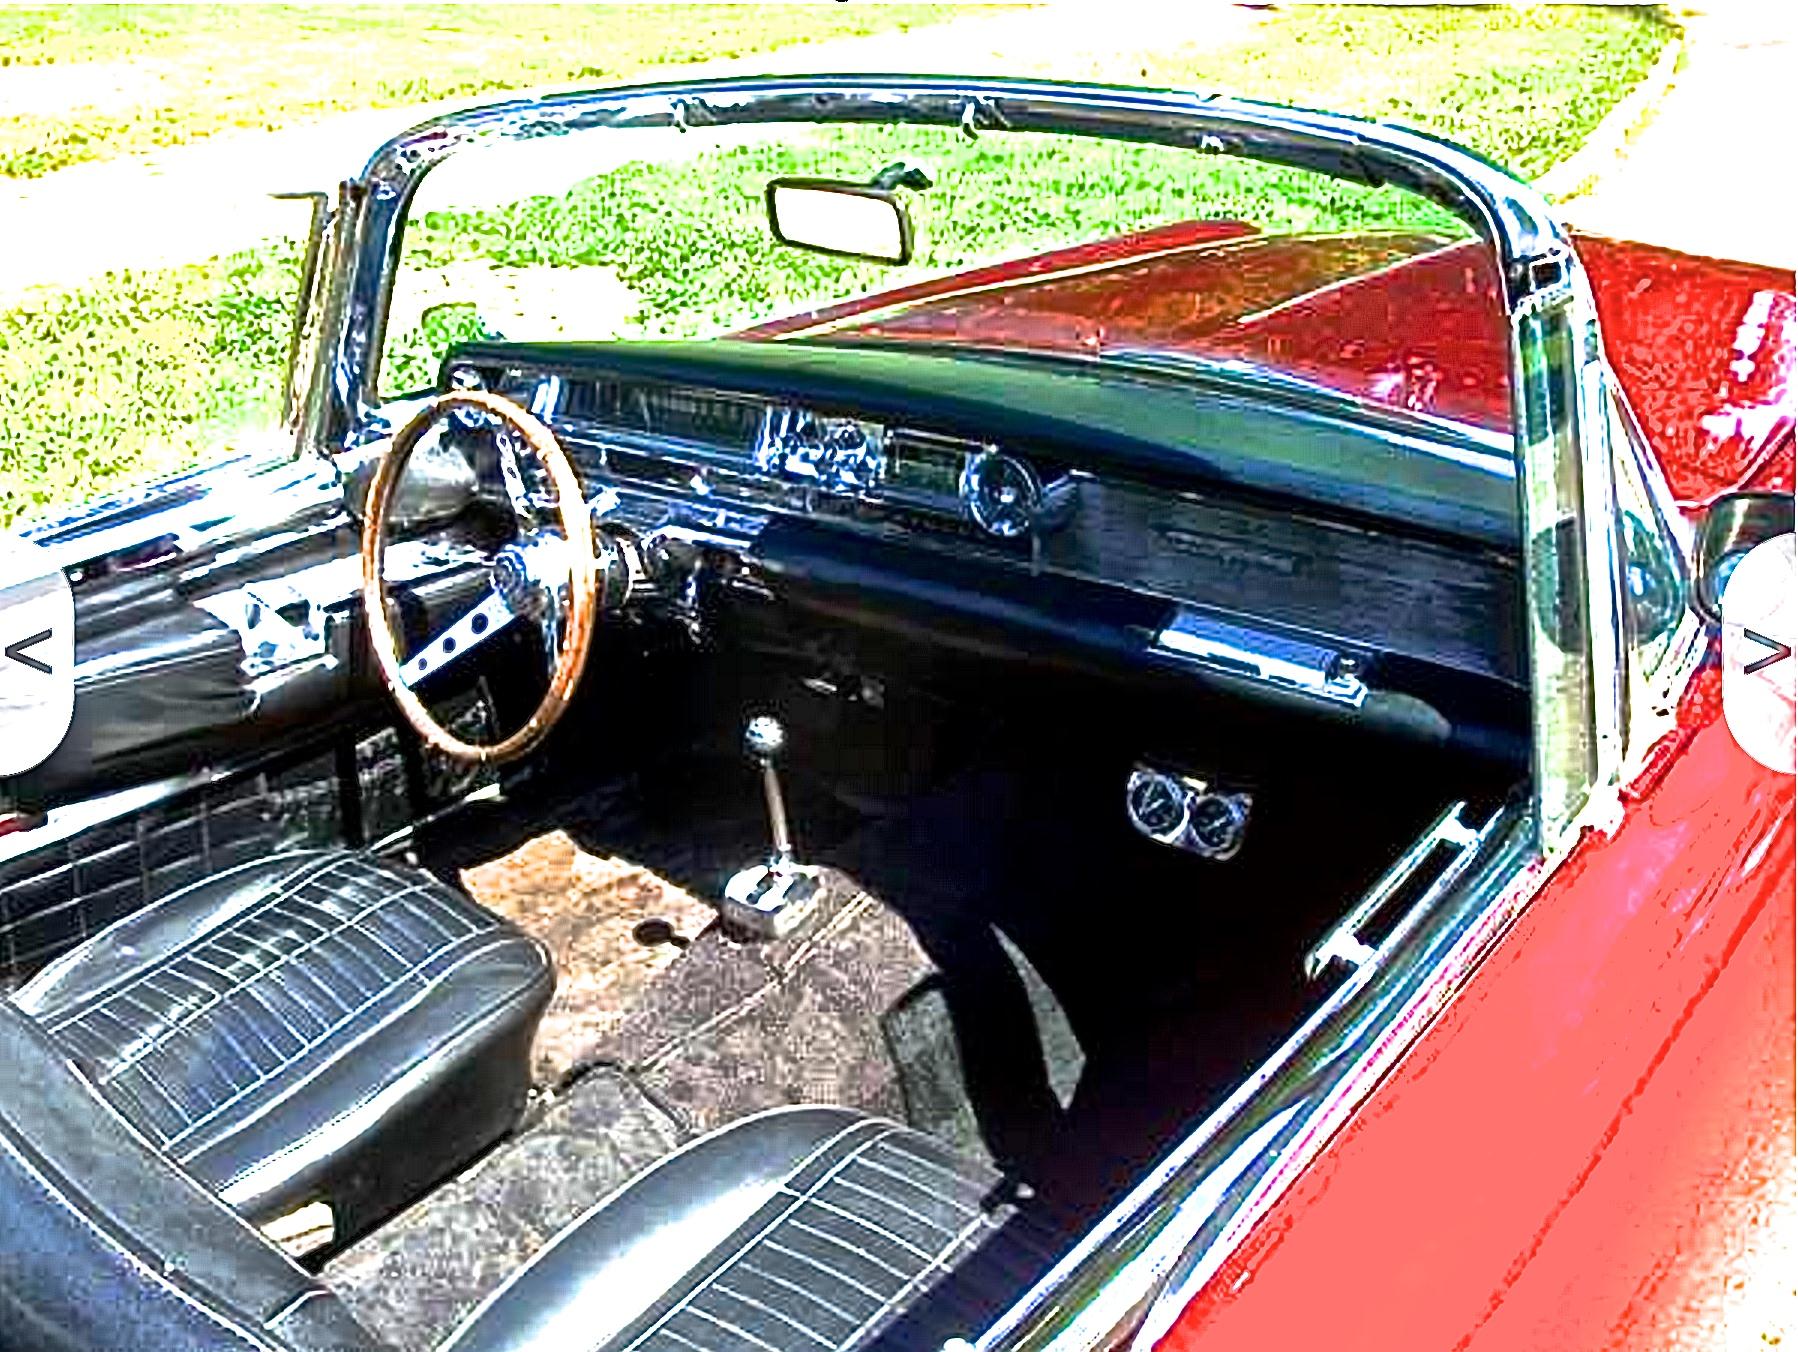 Dallas Craigslist: '56 T-Bird made into a 1965 Cadillac ...